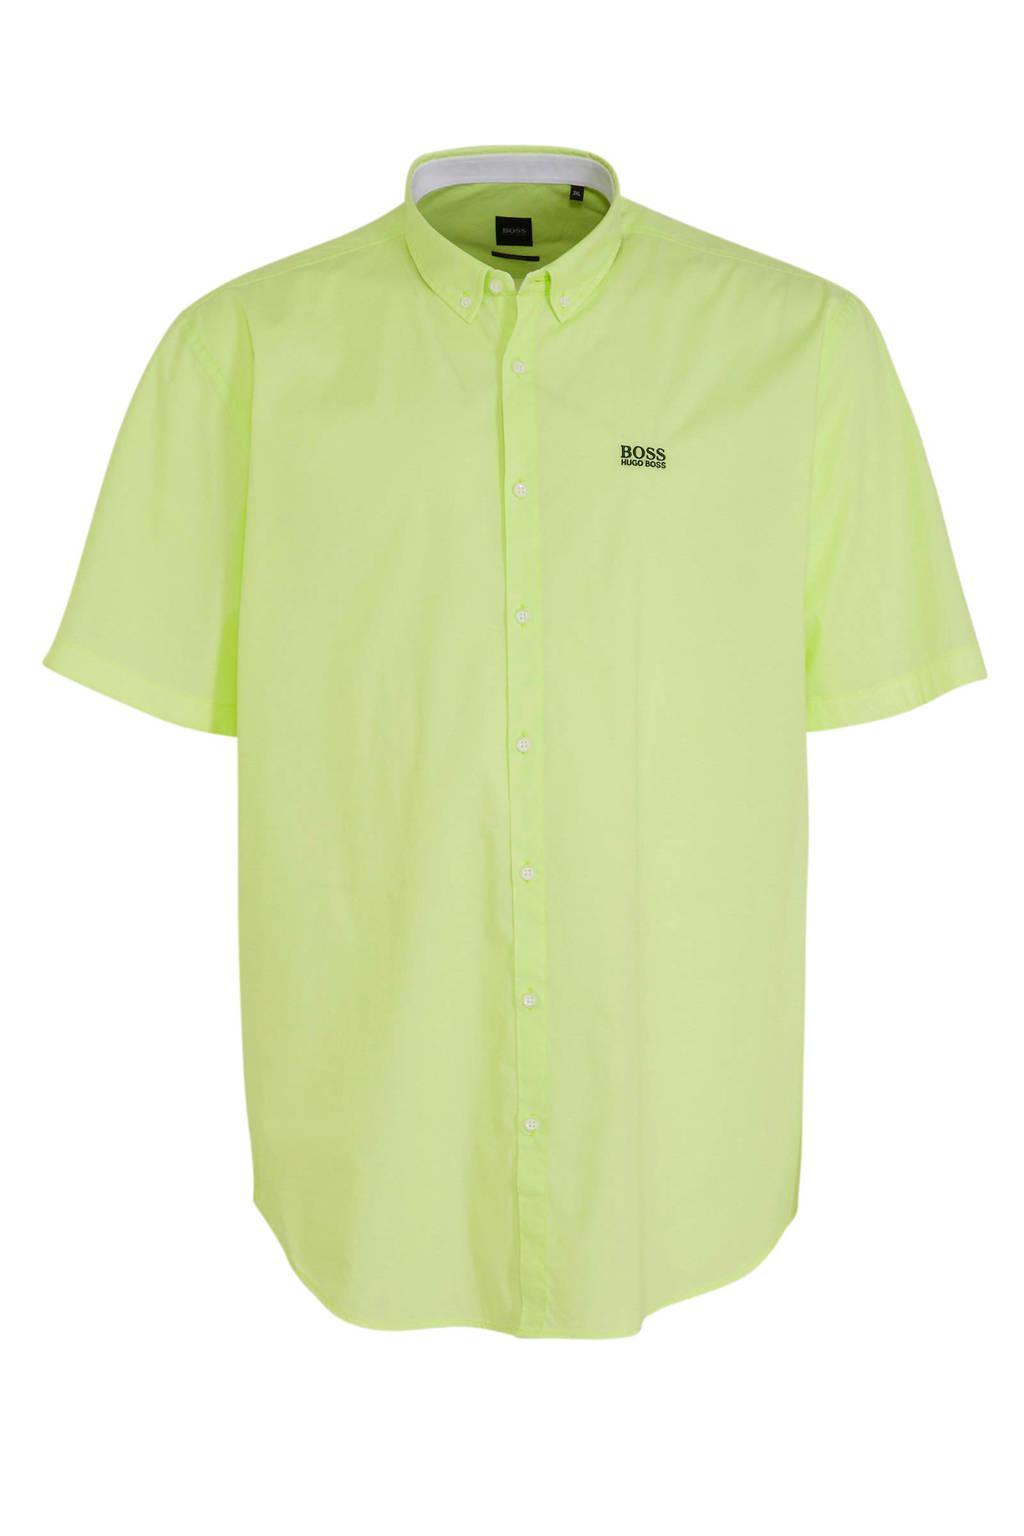 BOSS Athleisure Big & Tall regular fit overhemd met logo geel, Geel